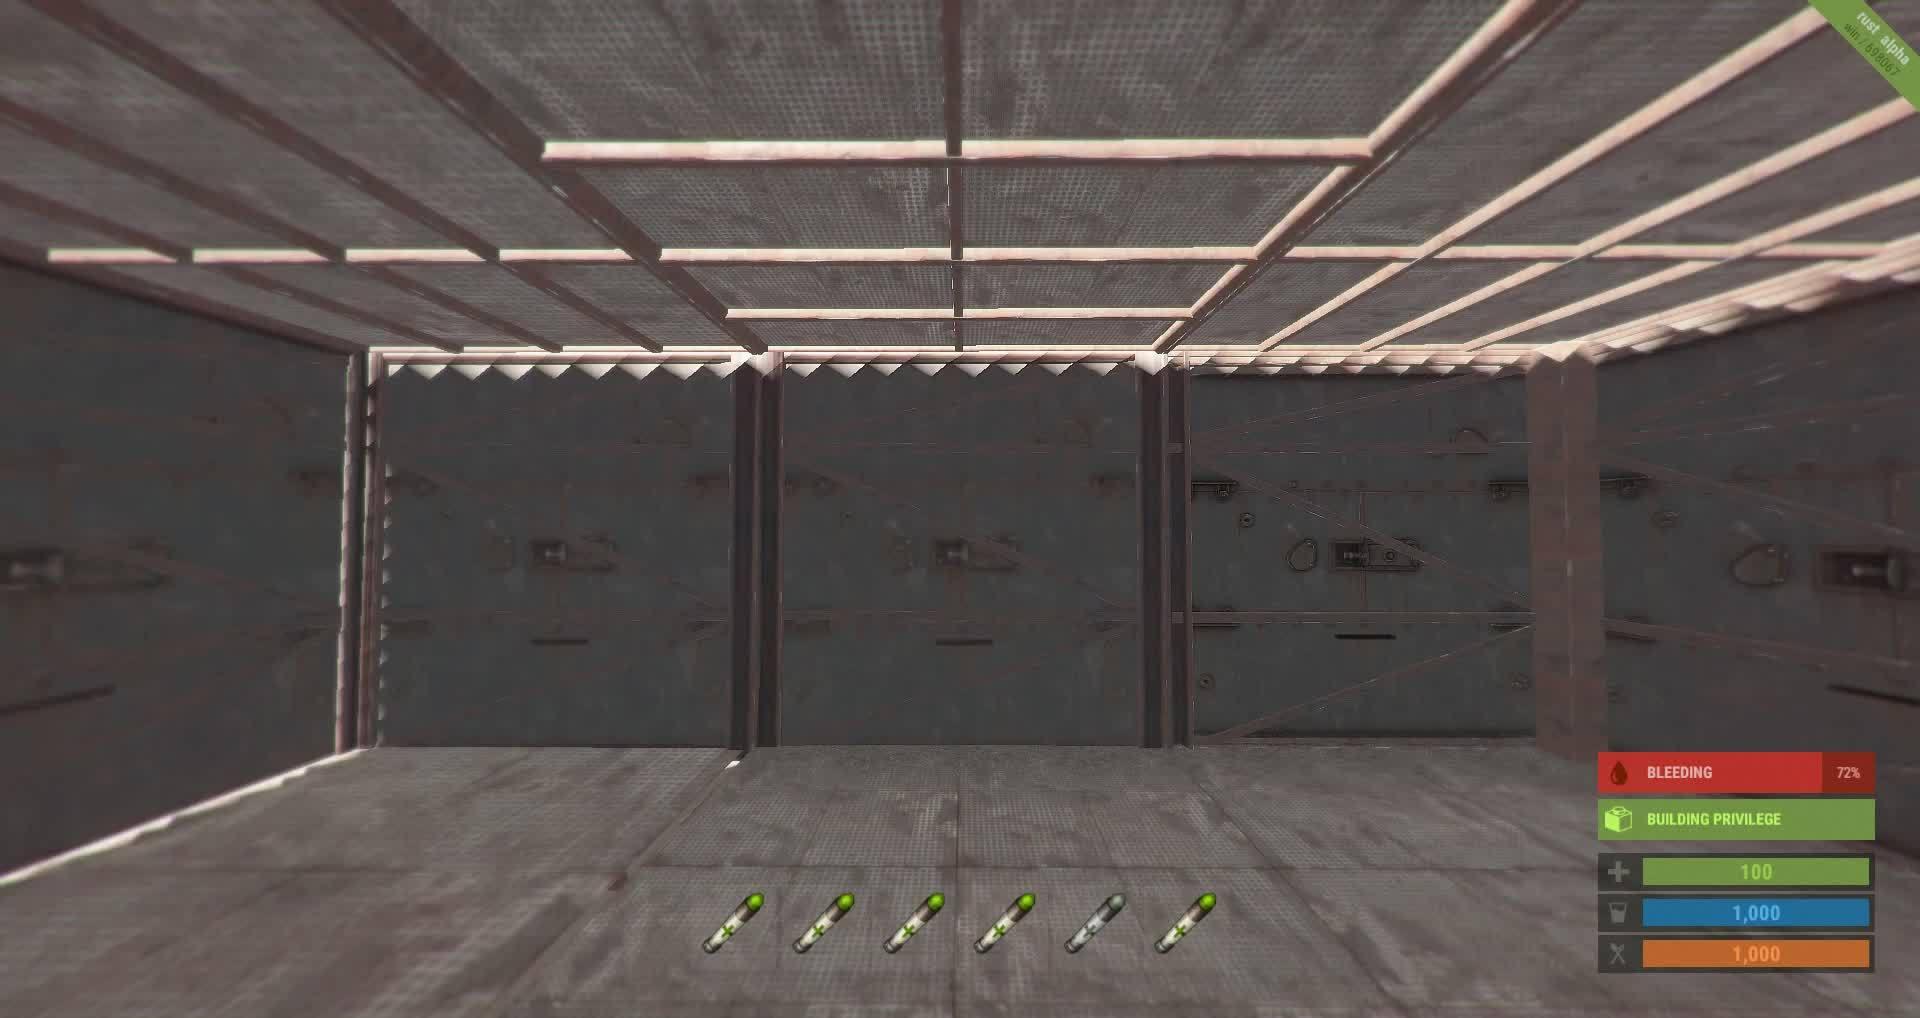 playrust, HV Semi-Automatic Pistol GIFs